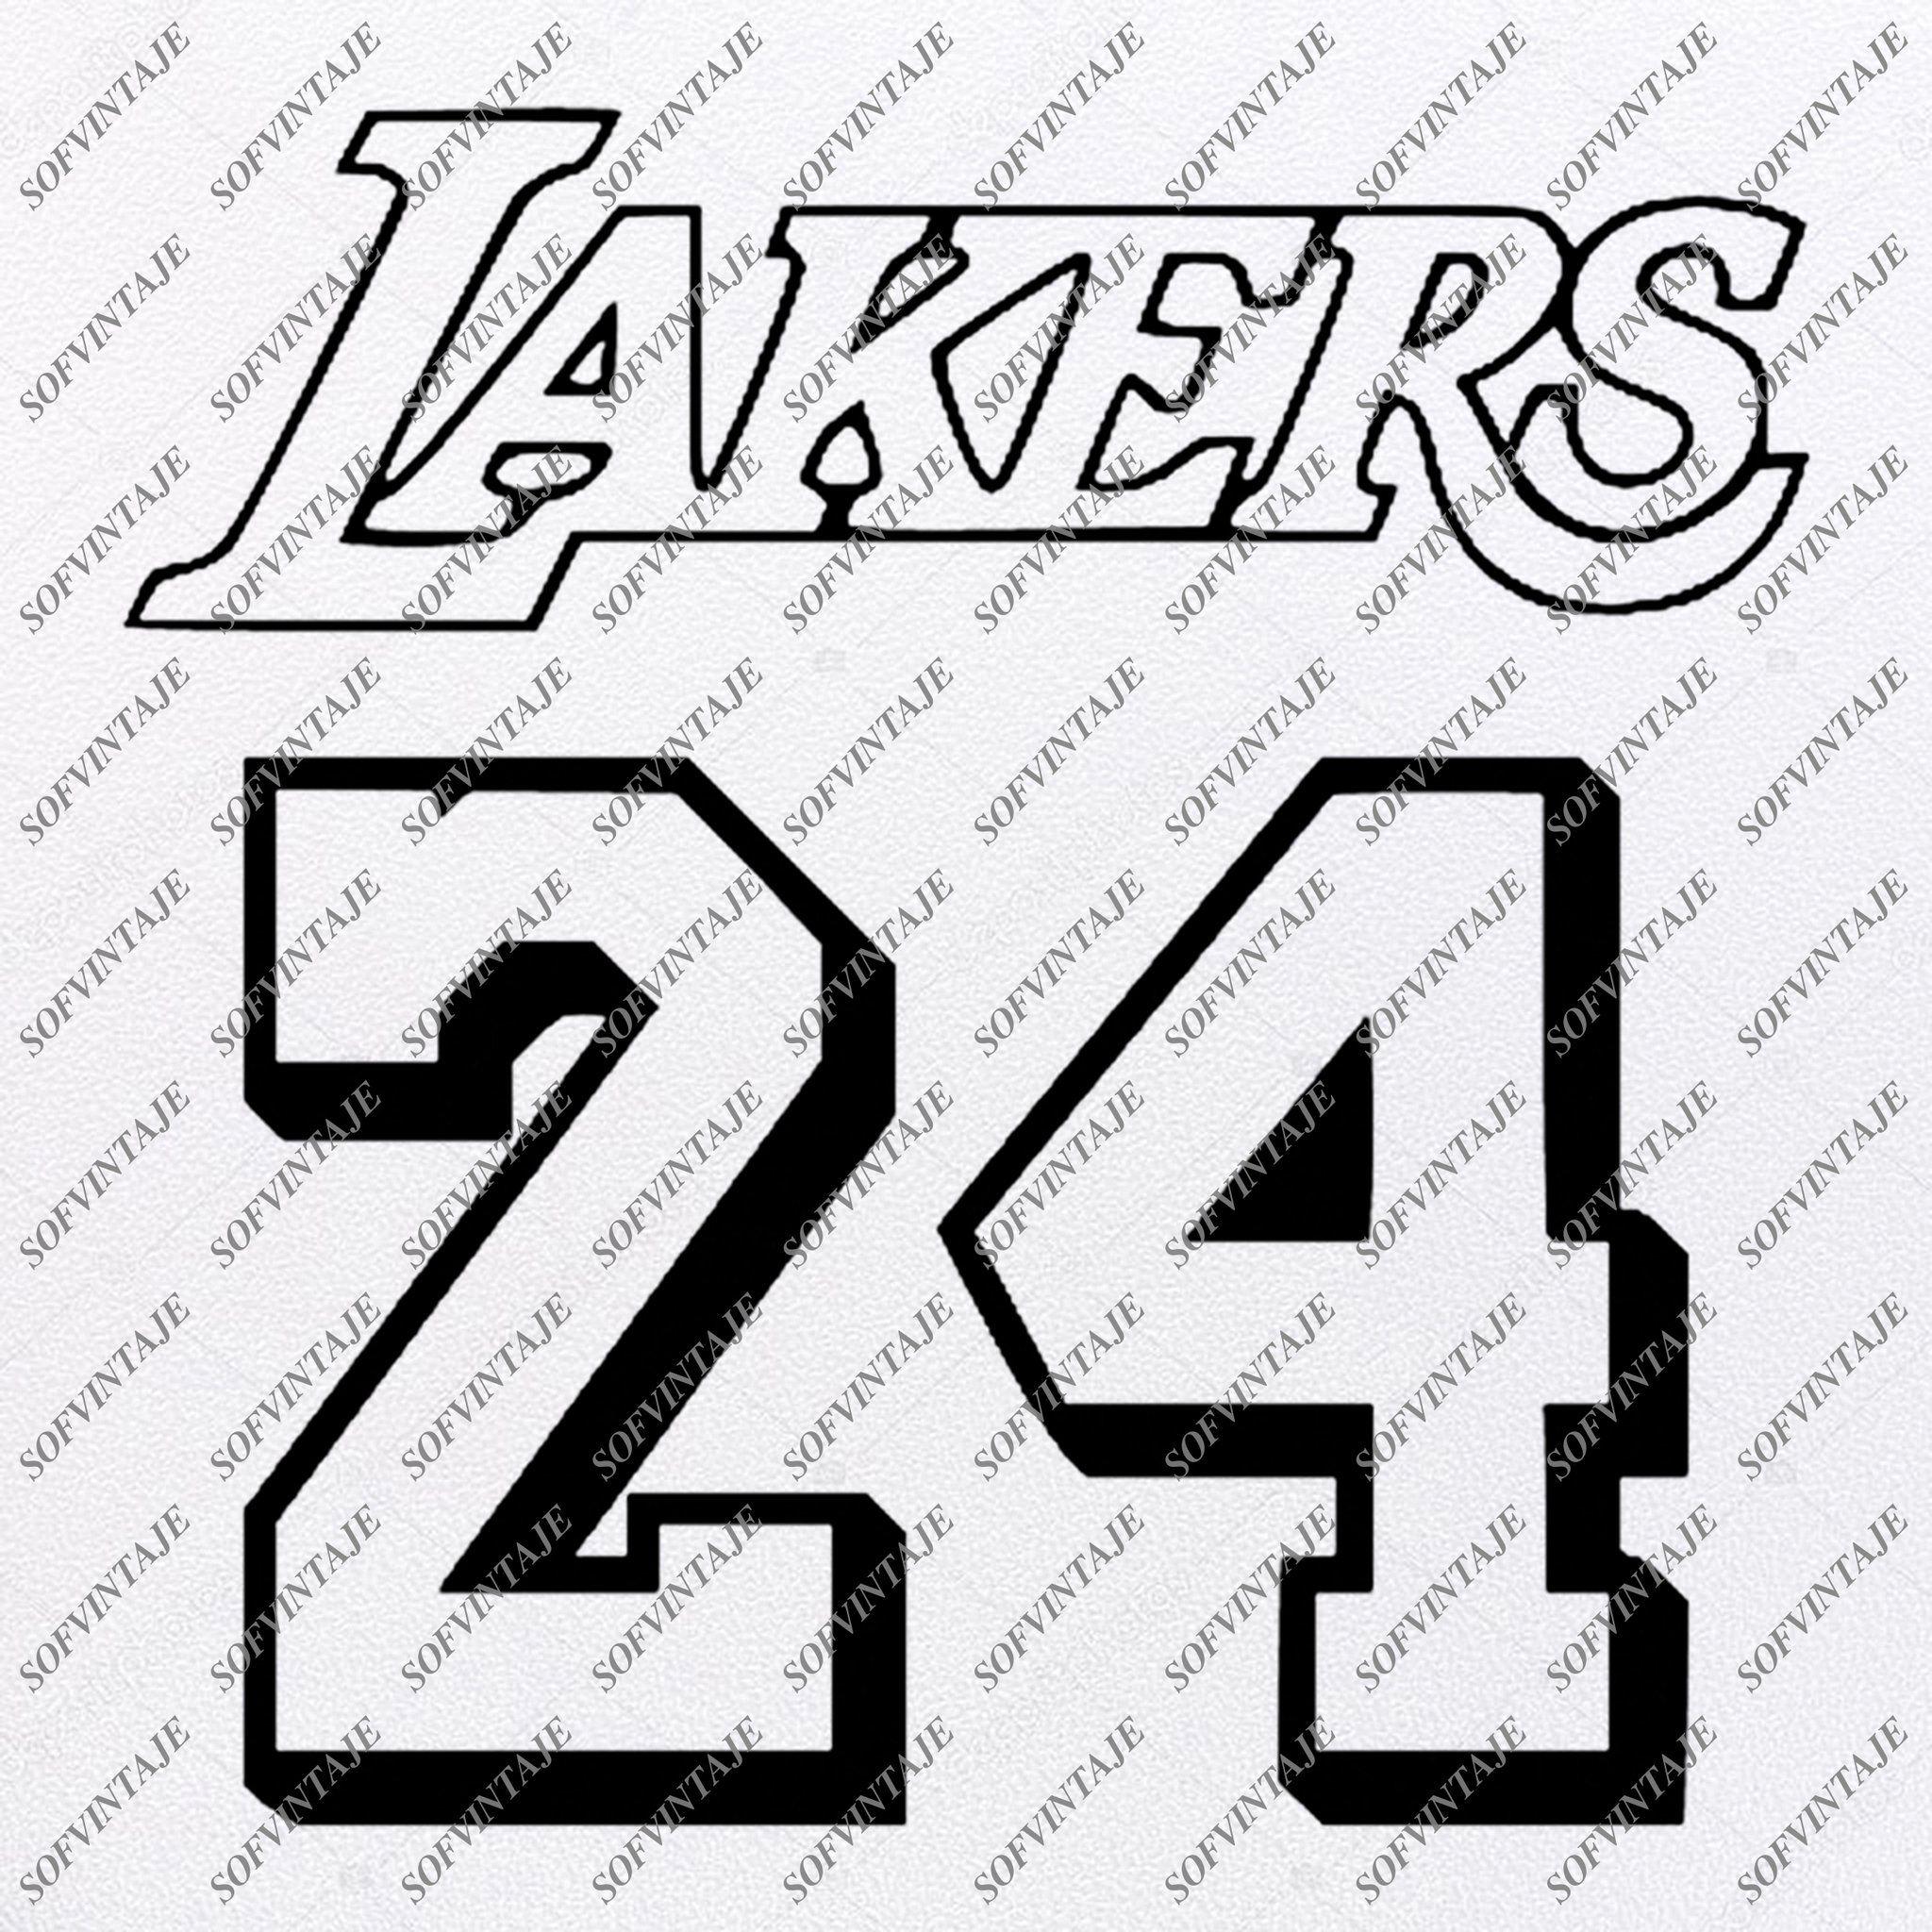 Kobe Bryant Svg Los Angeles Lakers Svg Basketball Svg Kobe Bryant Clip Art Top Players Svg Svg For Cricut Svg For Silhouette Svg Eps Pdf Dxf Png J Kobe [ 2048 x 2048 Pixel ]